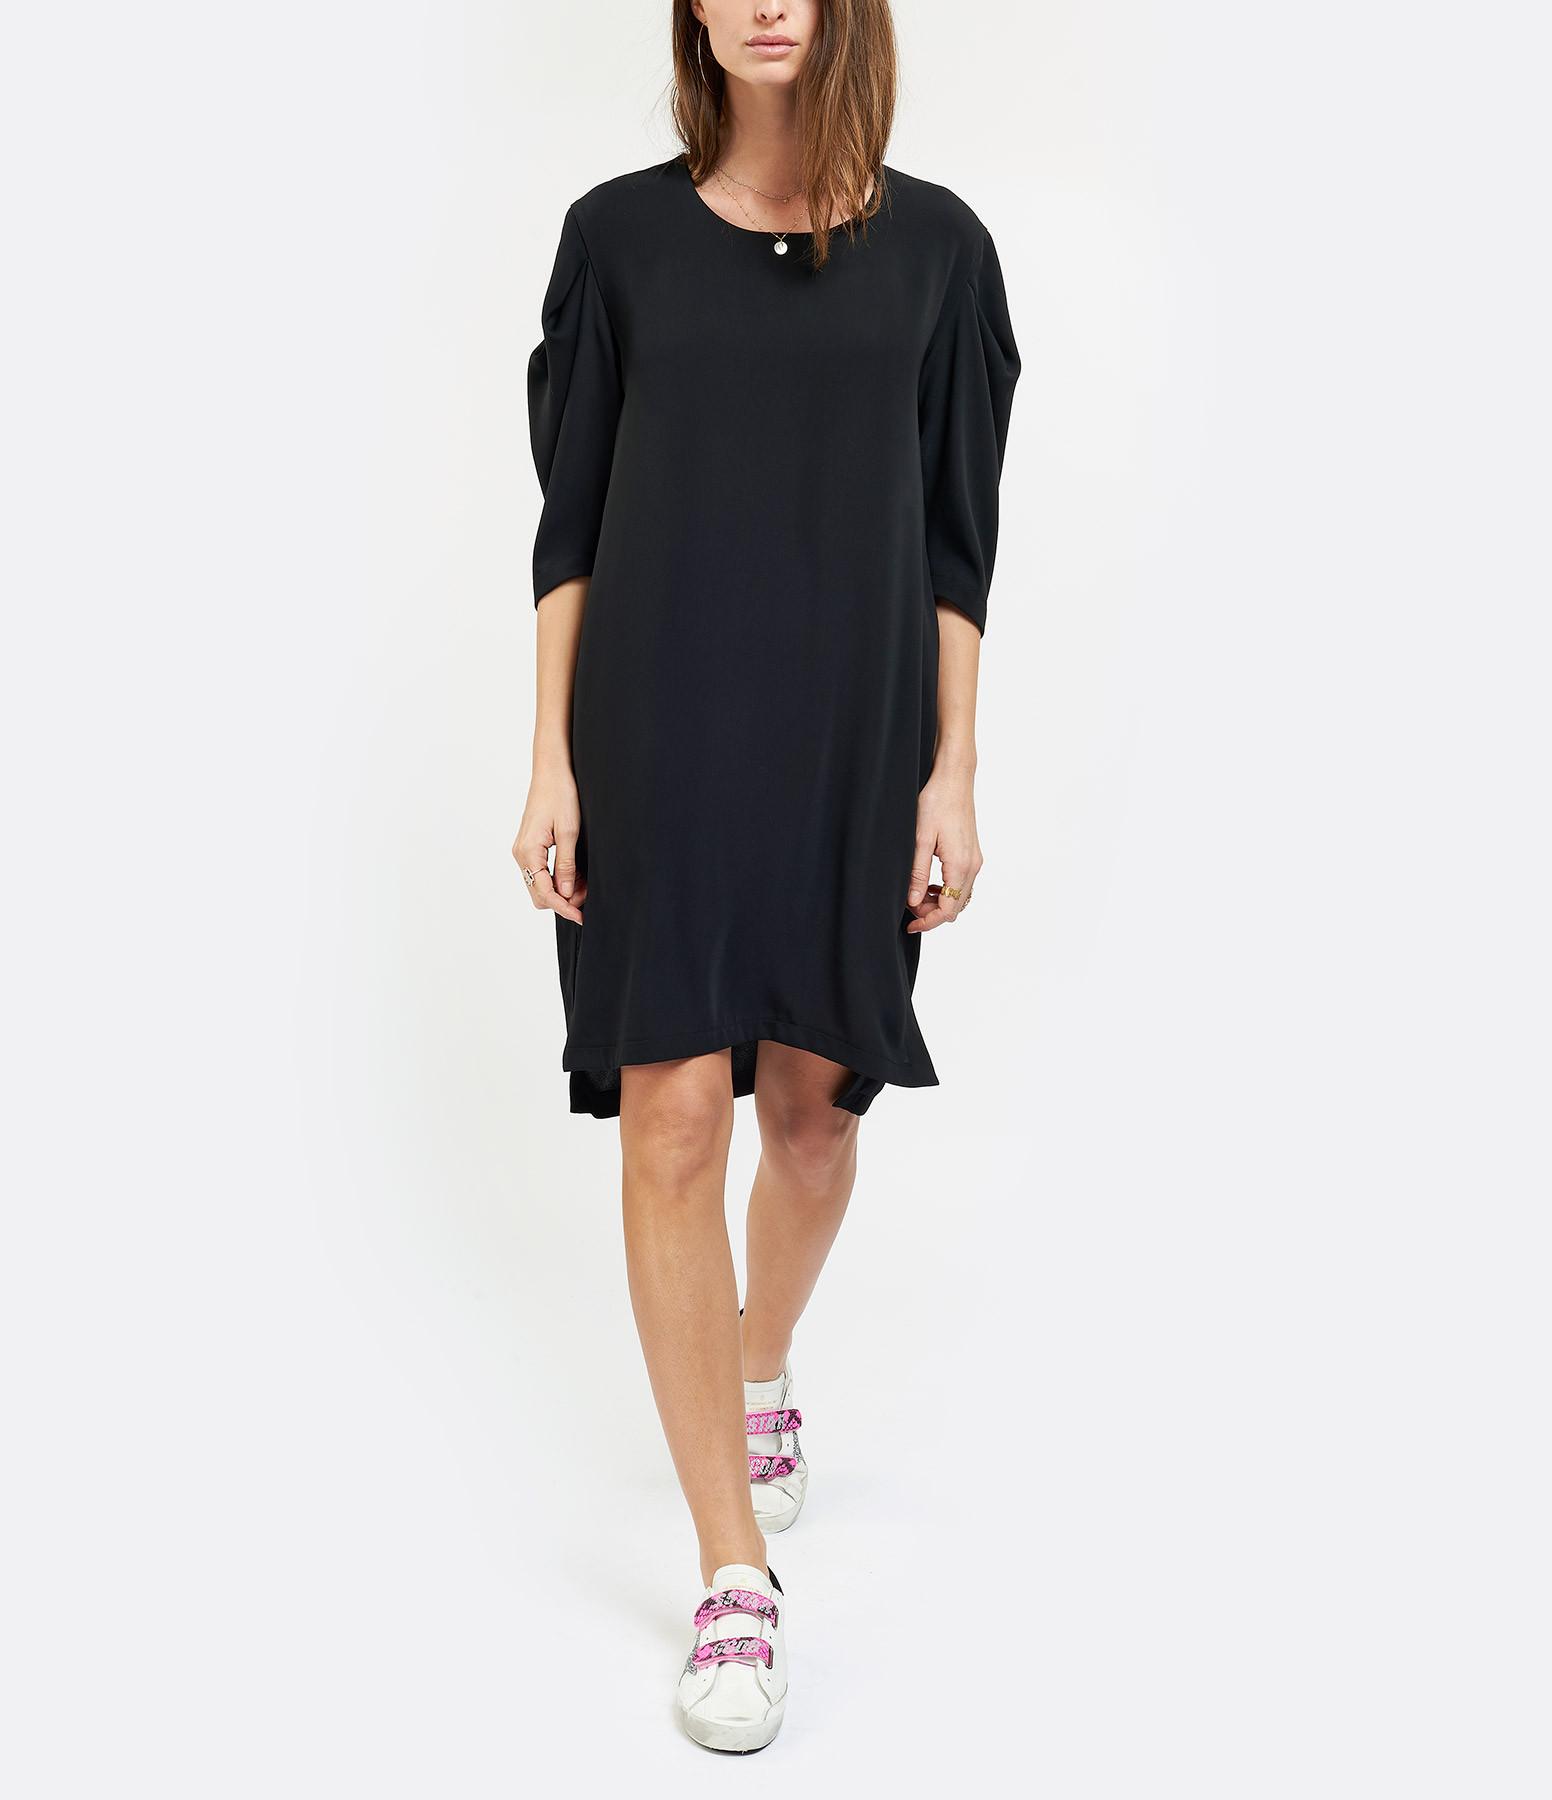 MM6 MAISON MARGIELA - Robe Fluide Noir